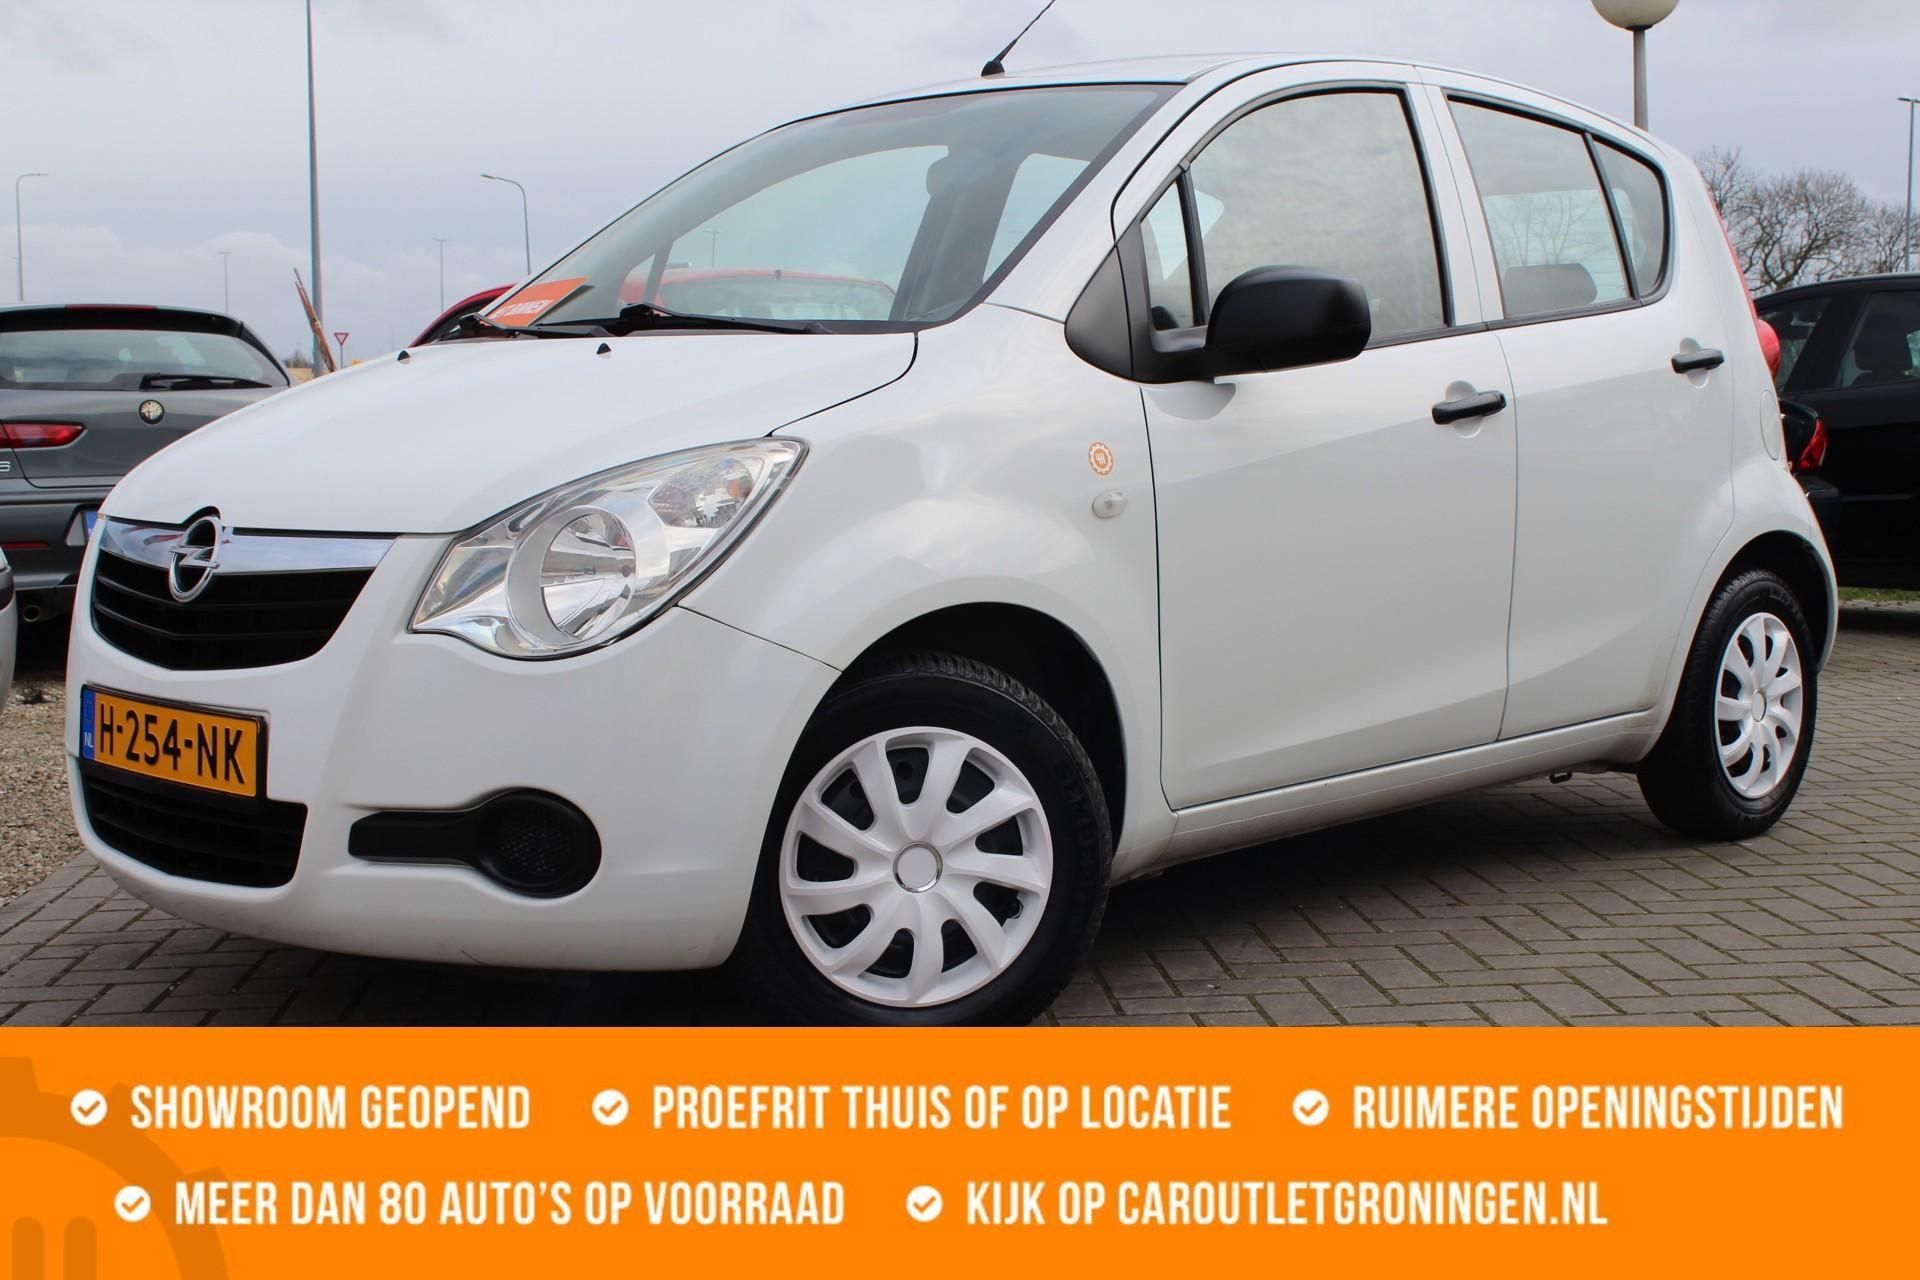 Caroutlet Groningen - Opel Agila 1.0 Edition | 2009 | CNG GAS | 5 DEURS | NW APK